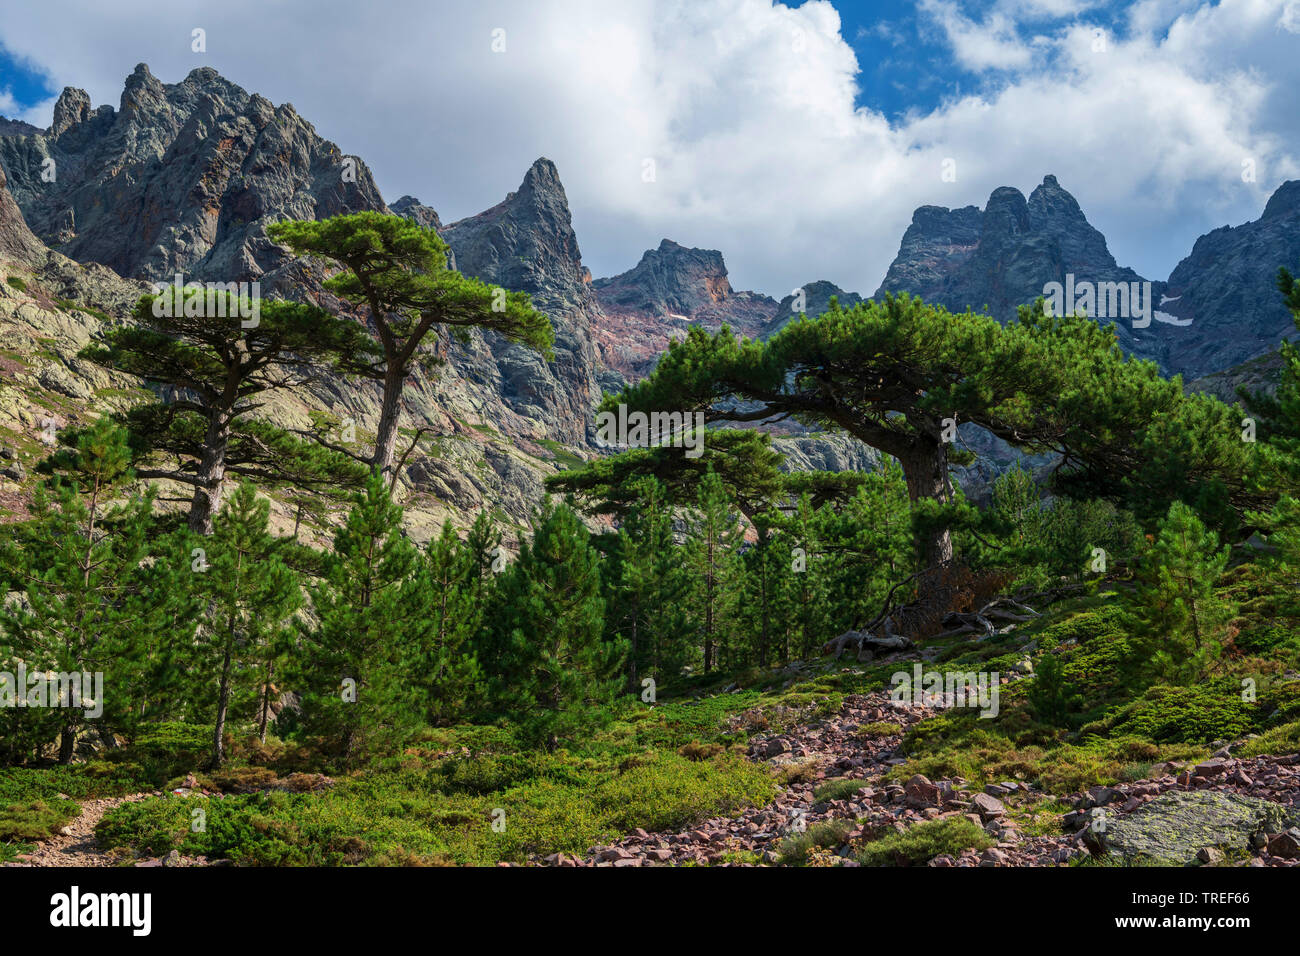 Foehre, Waldkiefer, Wald-Kiefer, Gemeine Kiefer (Pinus sylvestris), Kiefern im oberen Asco-Tal bei Sonnenaufgang, Frankreich, Korsika | Scotch pine, S - Stock Image